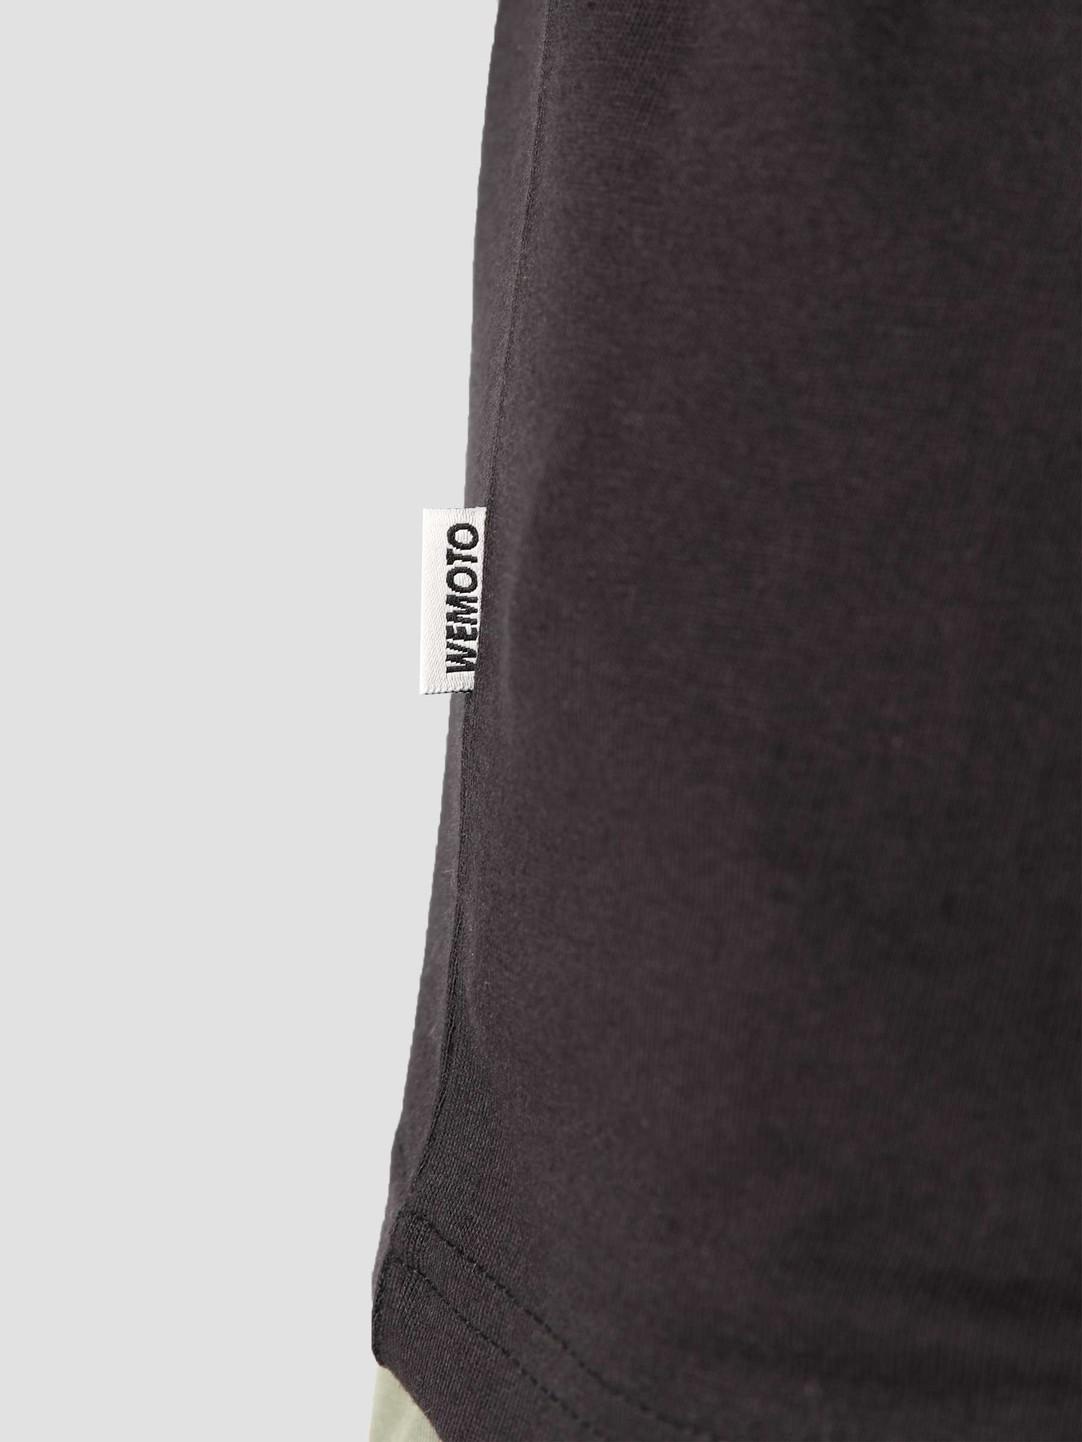 Wemoto Wemoto Fine T-Shirt Black 161.123-100